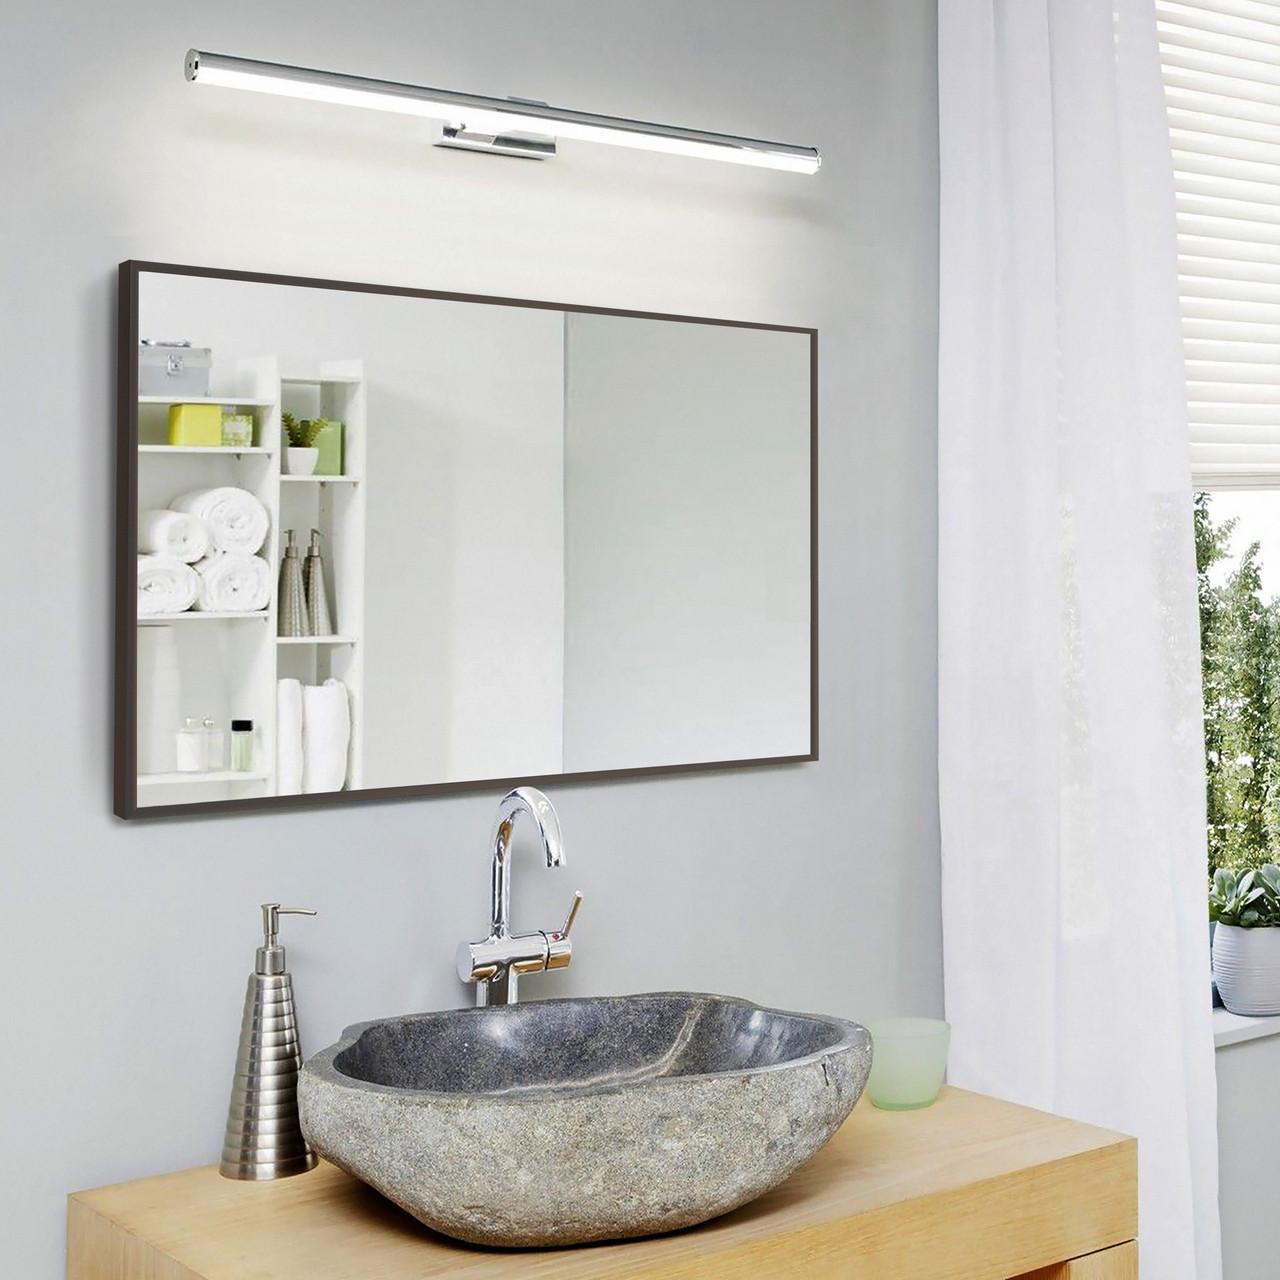 Зеркало для ванной 400х600 мм коричневого цвета пр. Украина